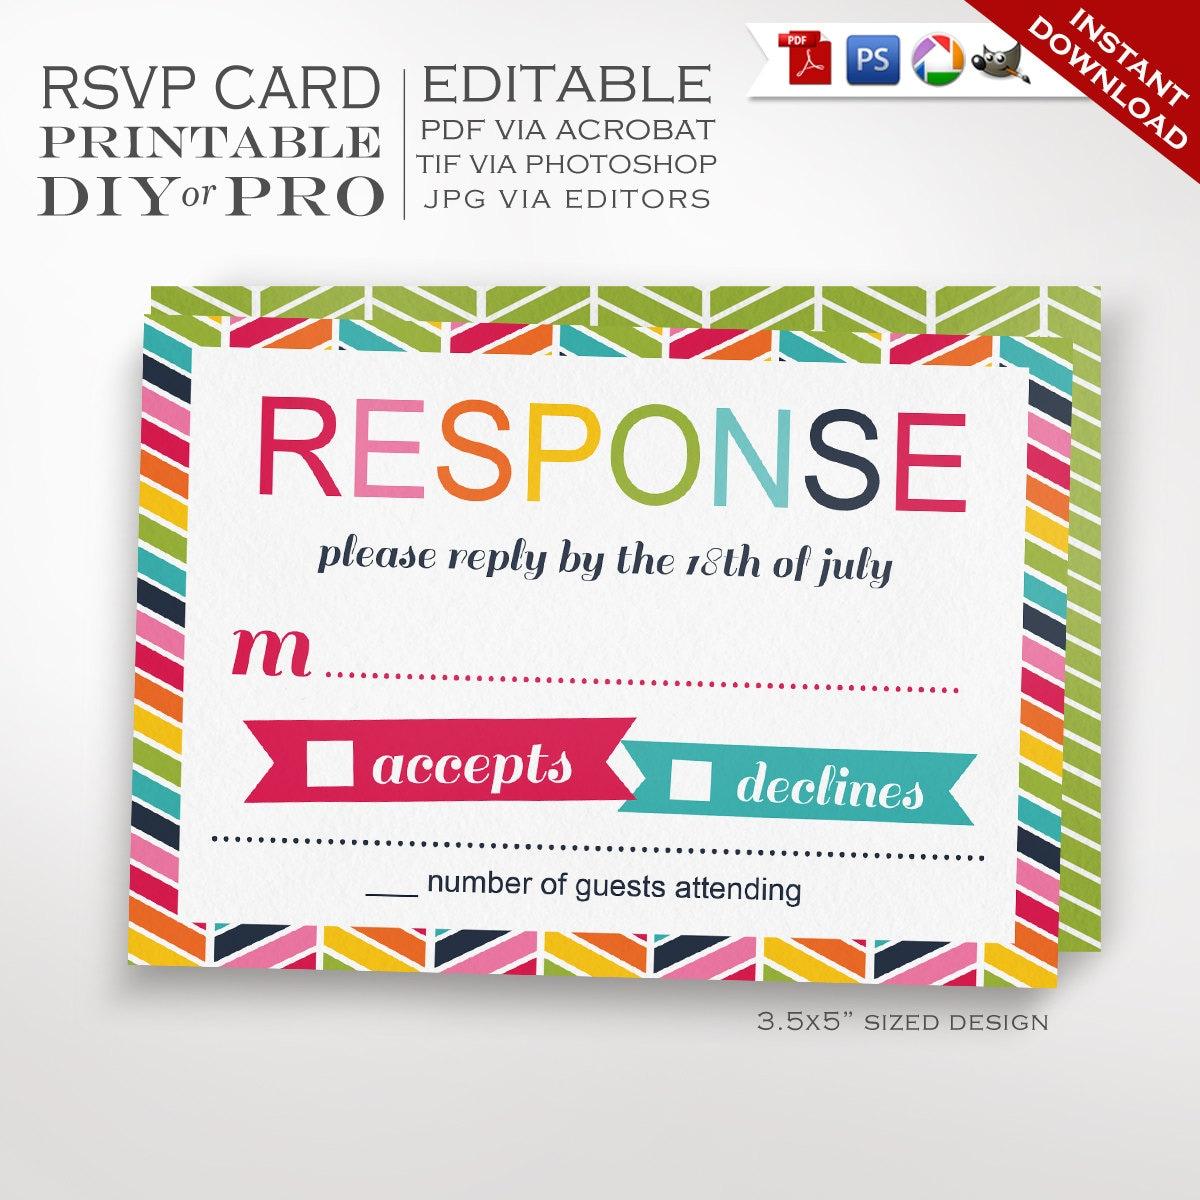 RSVP Wedding Template  Rainbow Wedding Response Card  Printable DIY Rainbow Chevron Wedding Editable Custom RSVP Bright Wedding Stationery